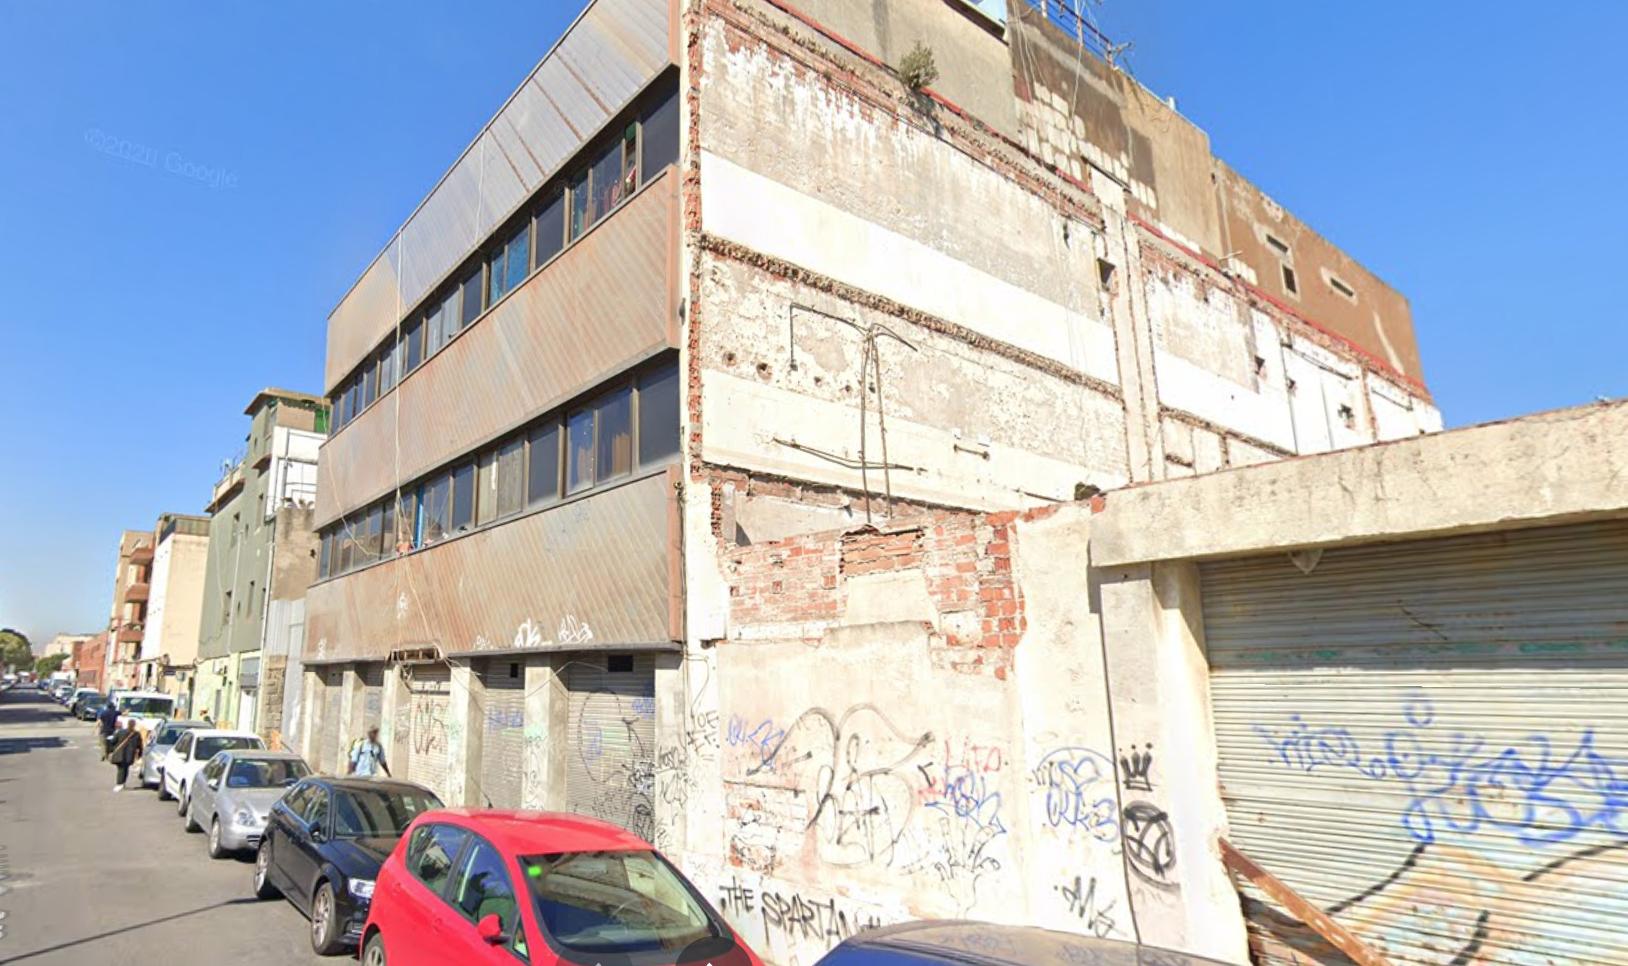 Fuente: Google Maps/ Calle Tortosa, Badalona